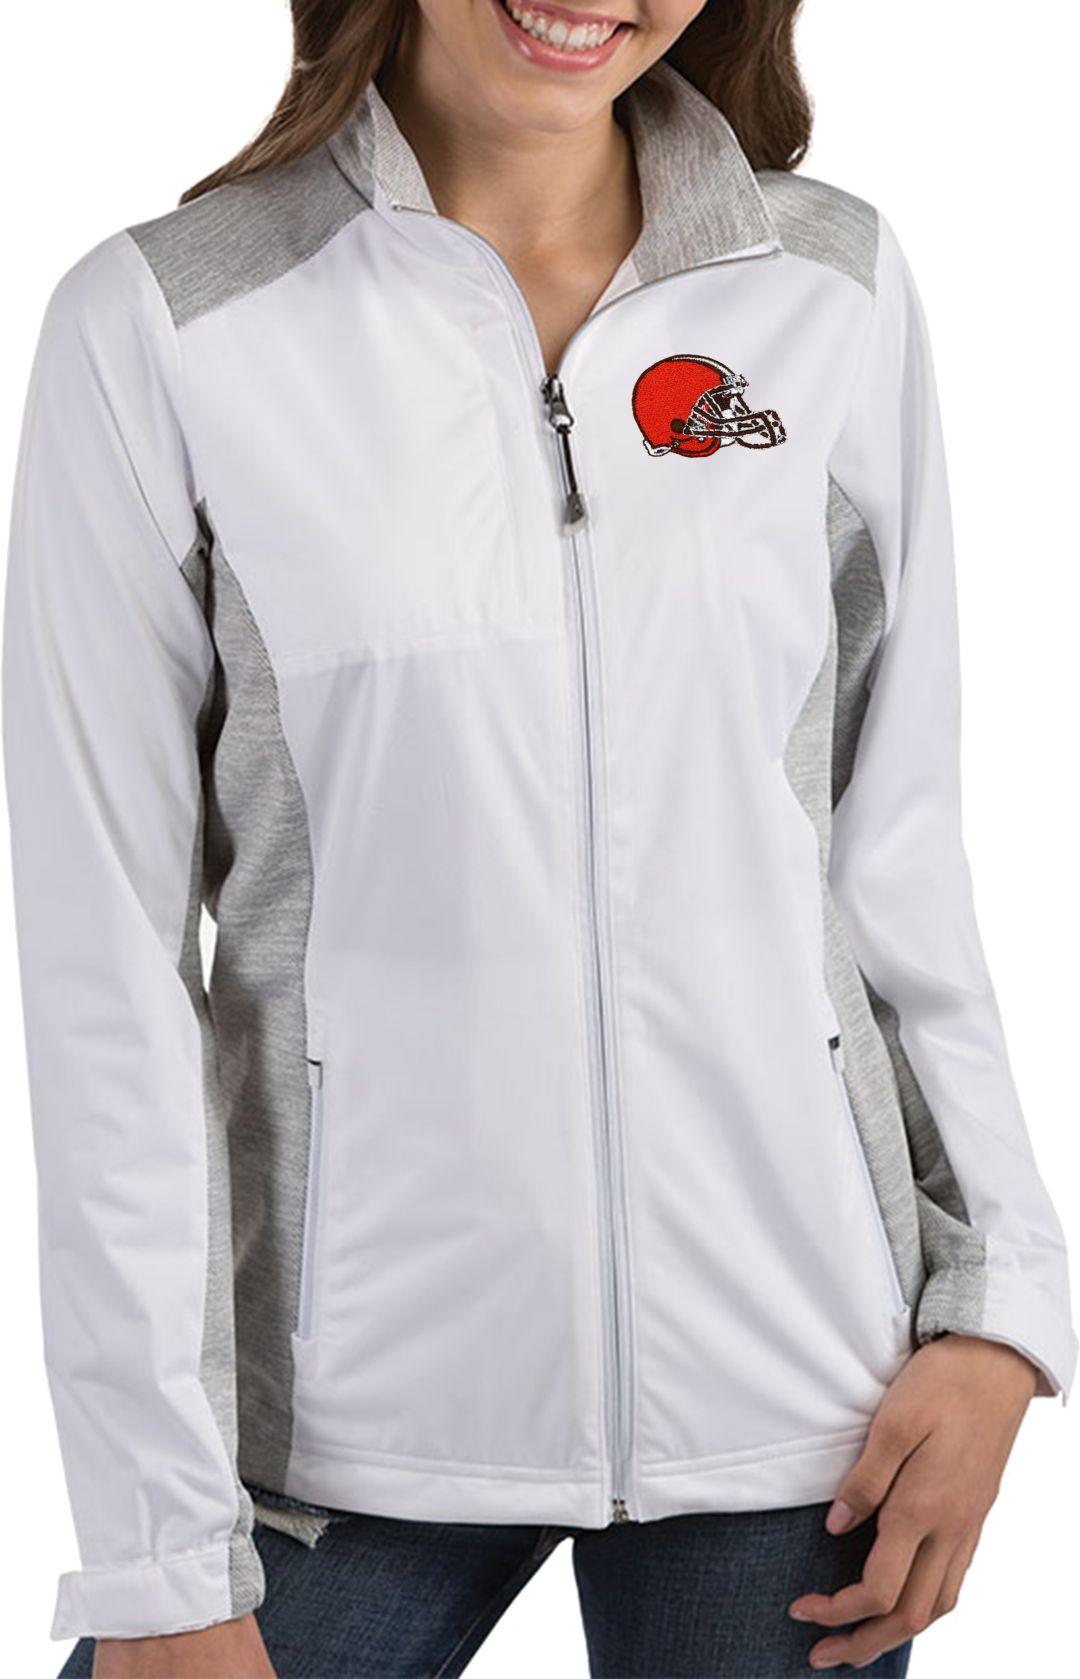 712f0505 Antigua Women's Cleveland Browns Revolve White Full-Zip Jacket